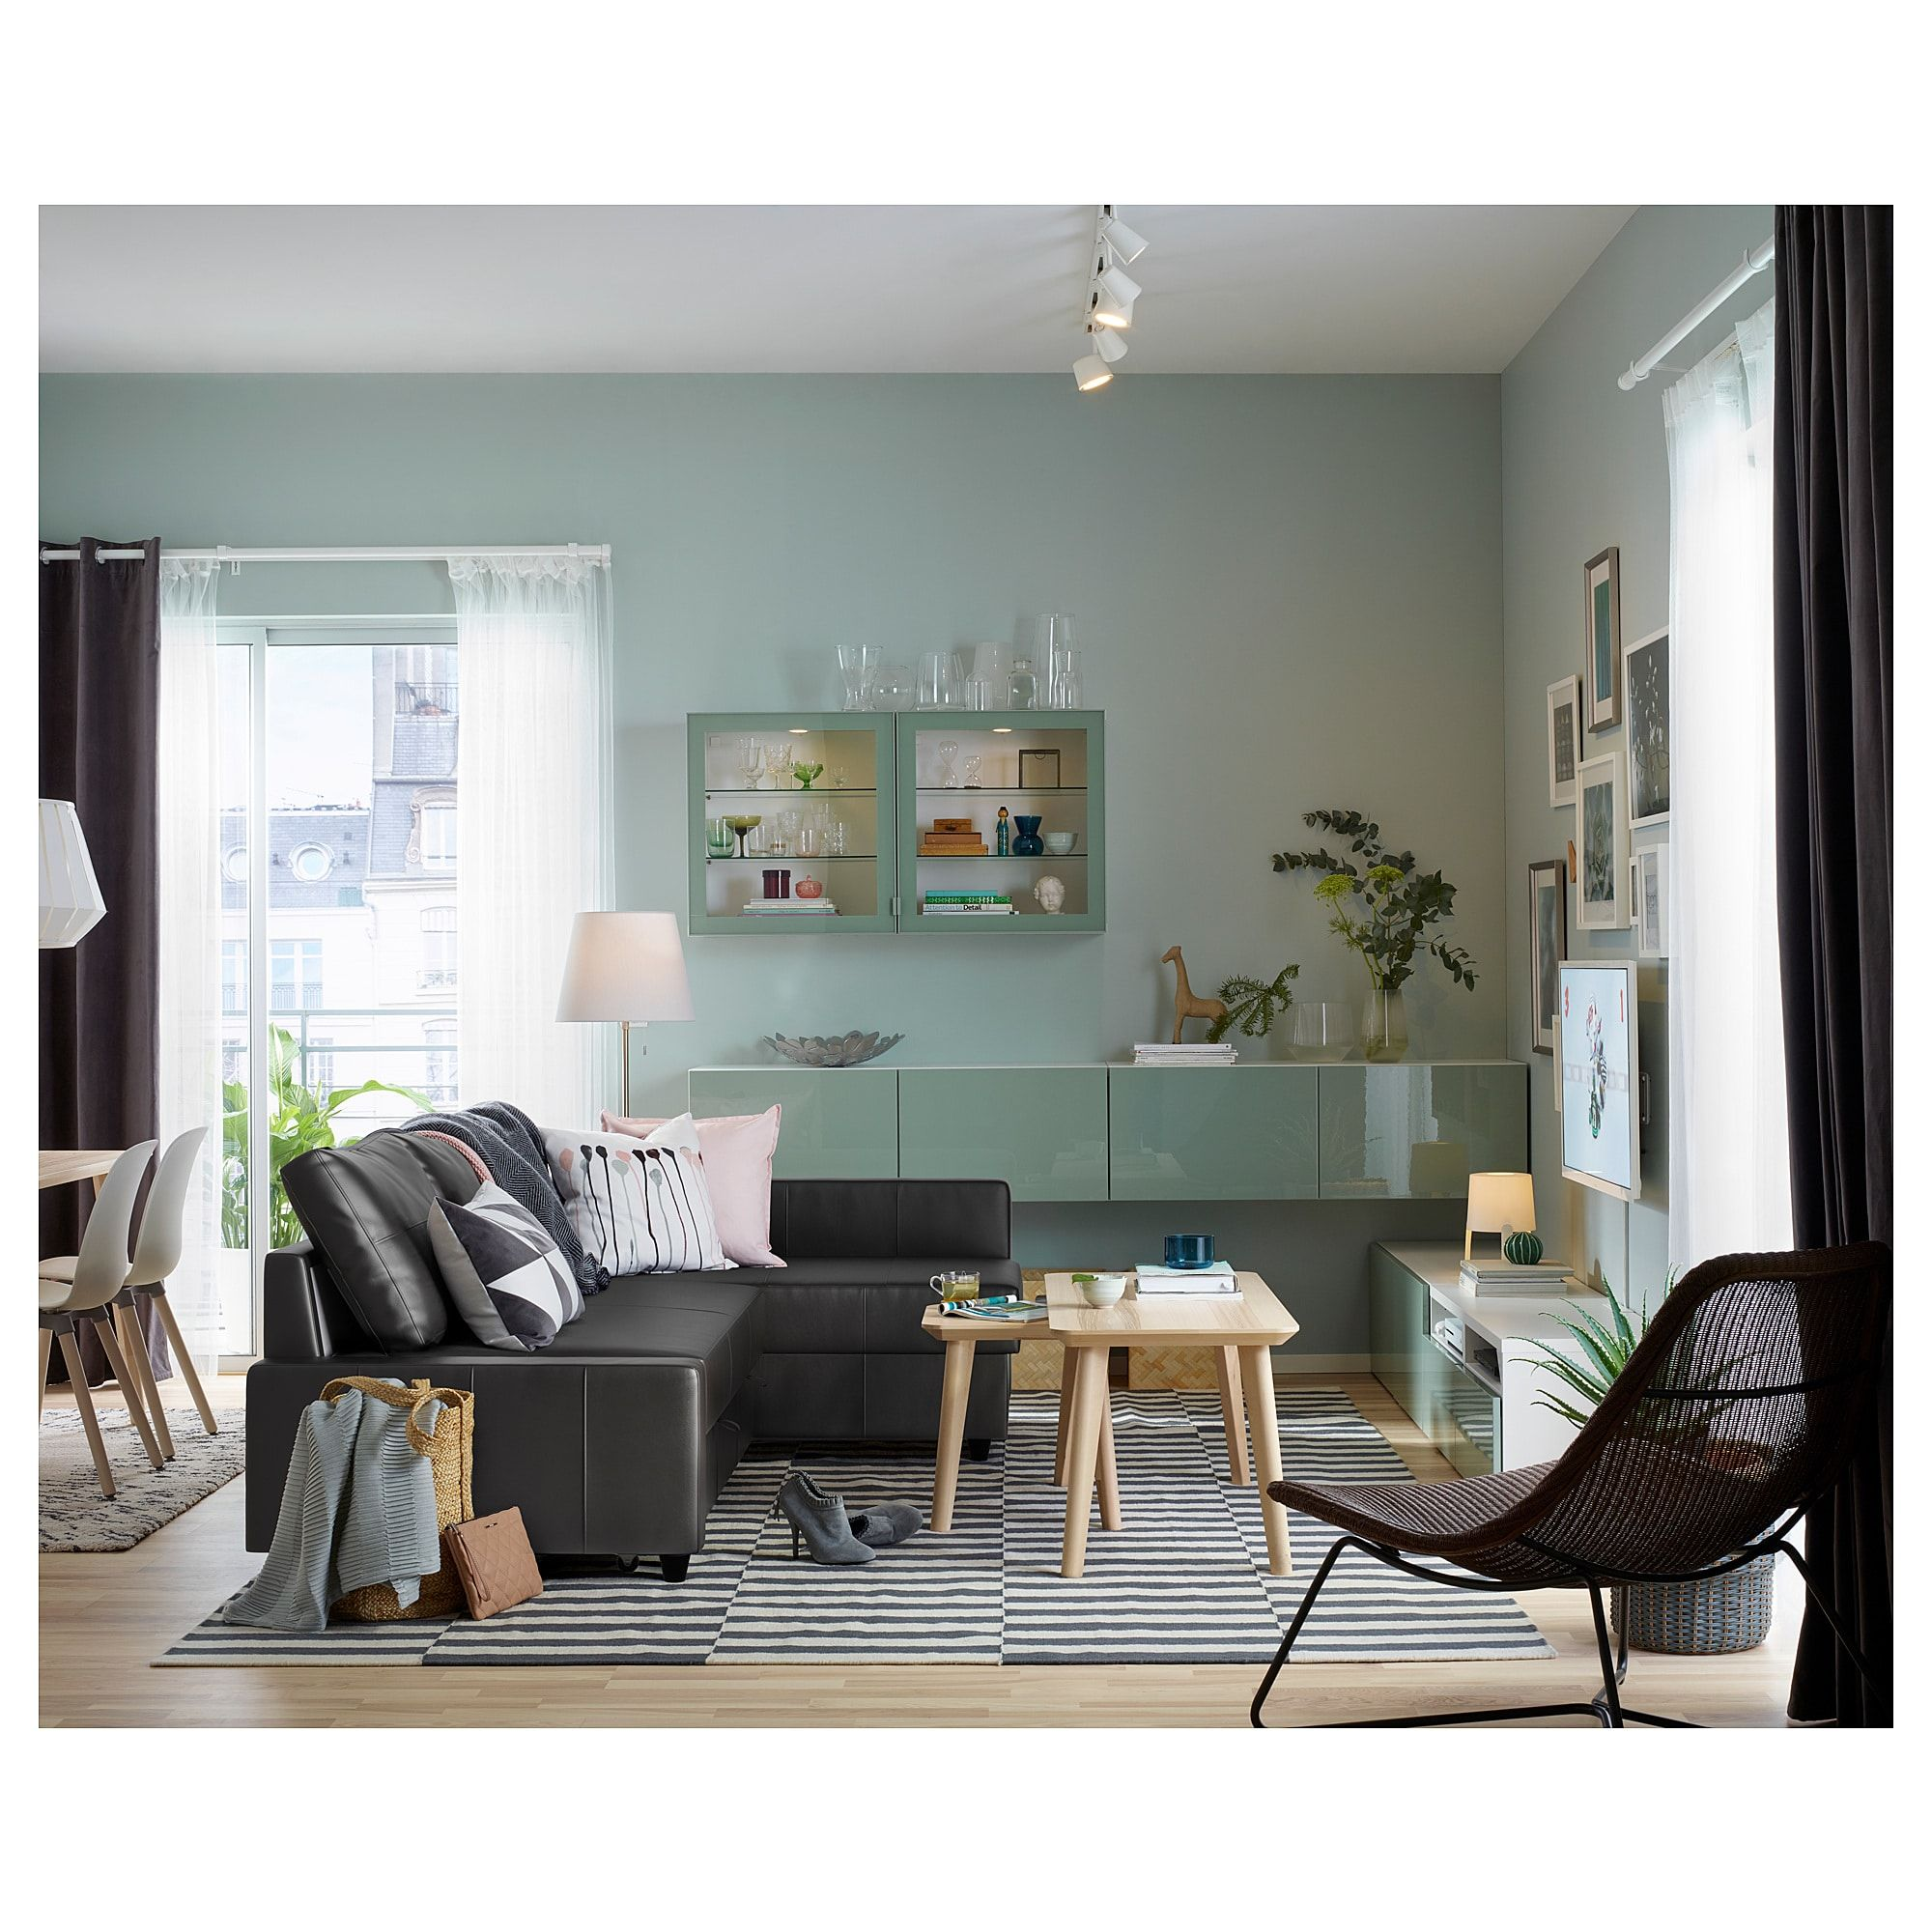 Friheten Hoekslaapbank Skiftebo Donkergrijs Ikea.Friheten Corner Sofa Bed With Storage Skiftebo Dark Gray